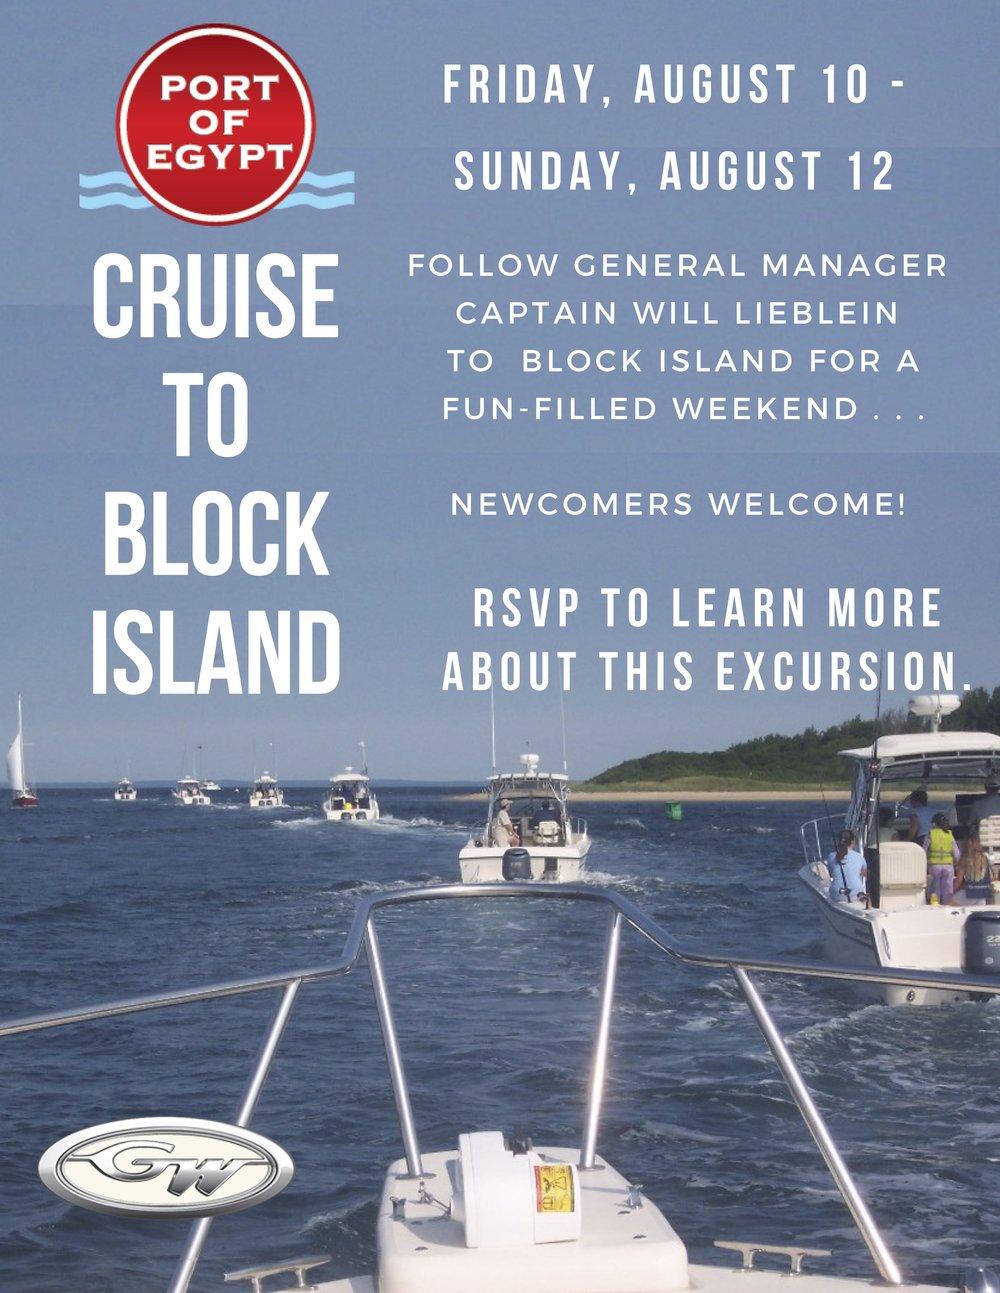 POE JPG flyer_Cruise to Block Island.jpg